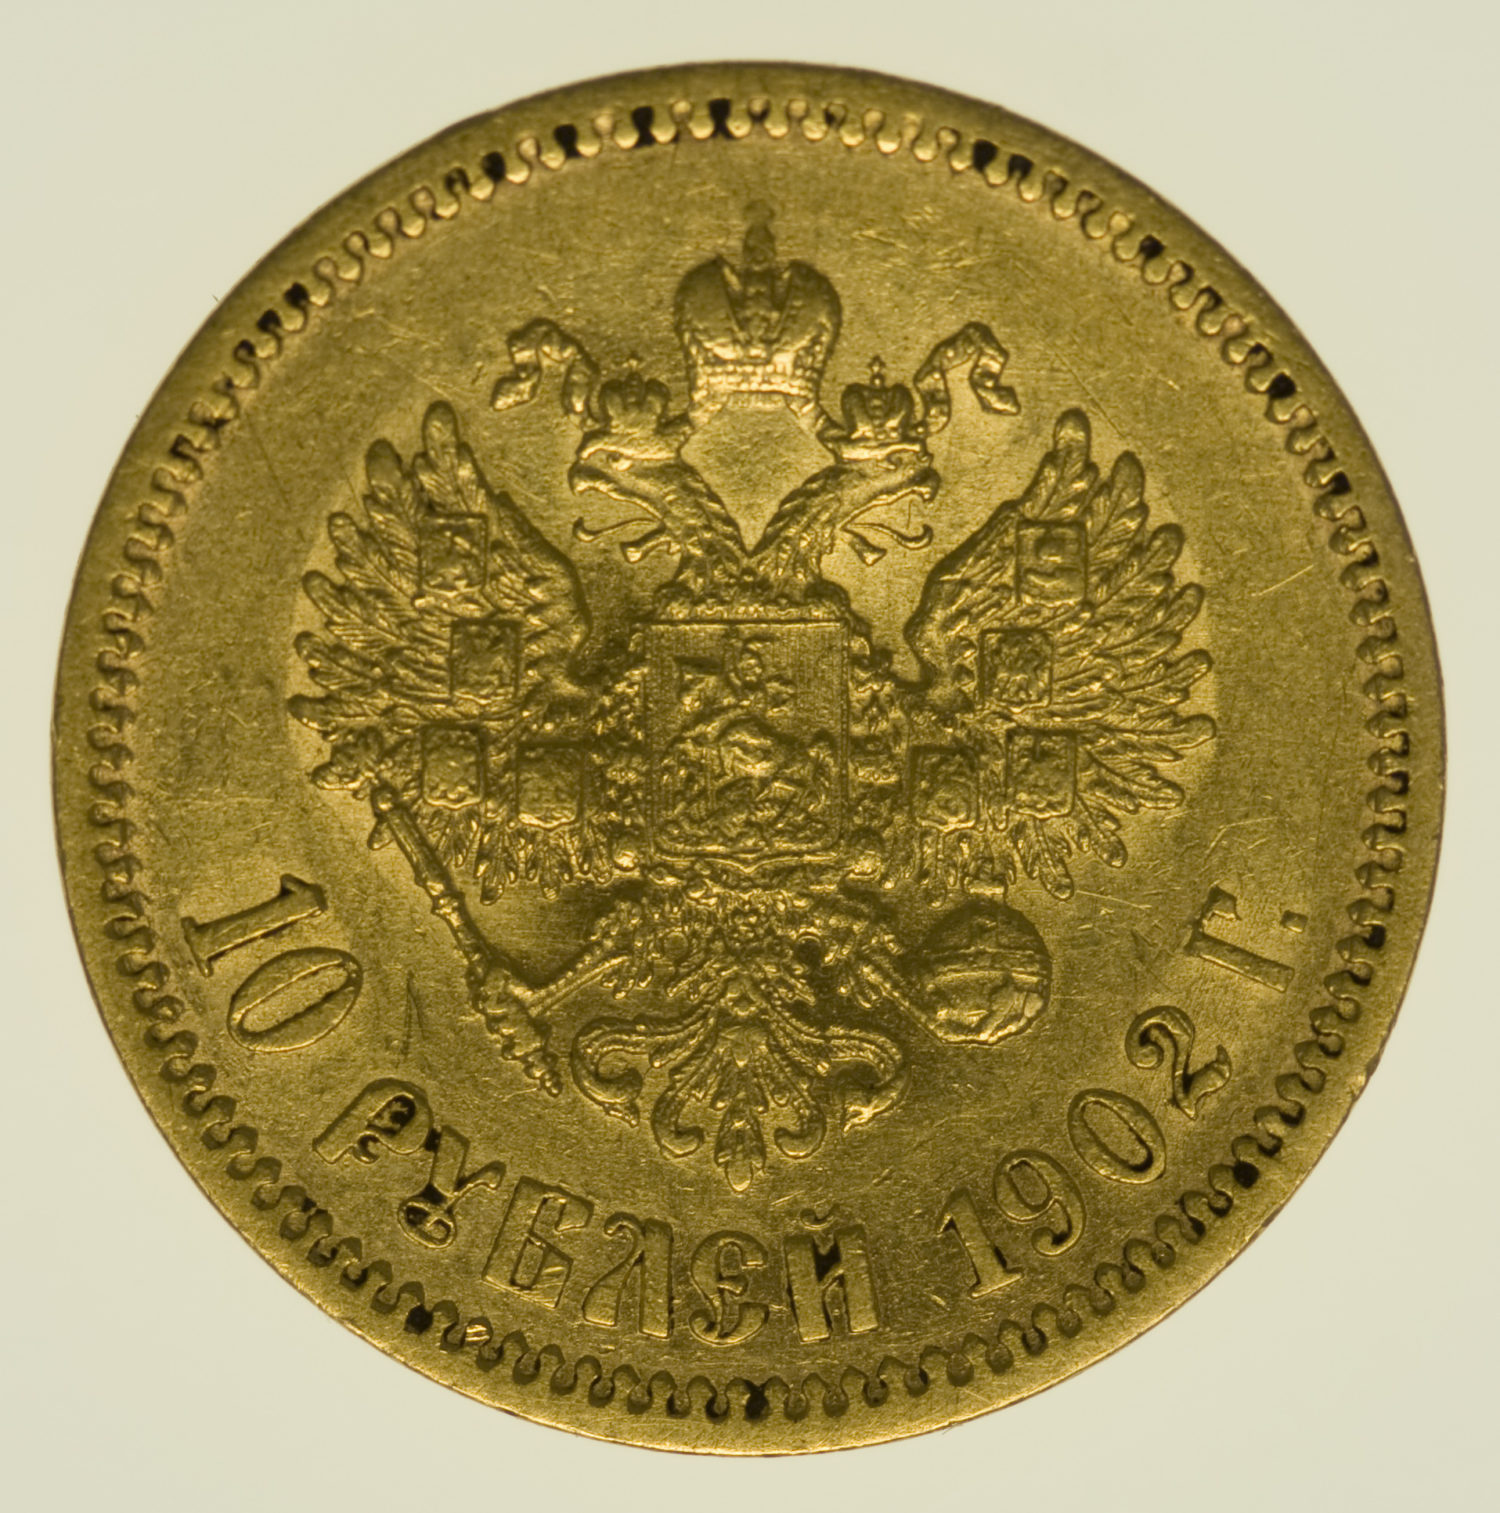 russland - RusslandNikolaus II.10 Rubel 1902